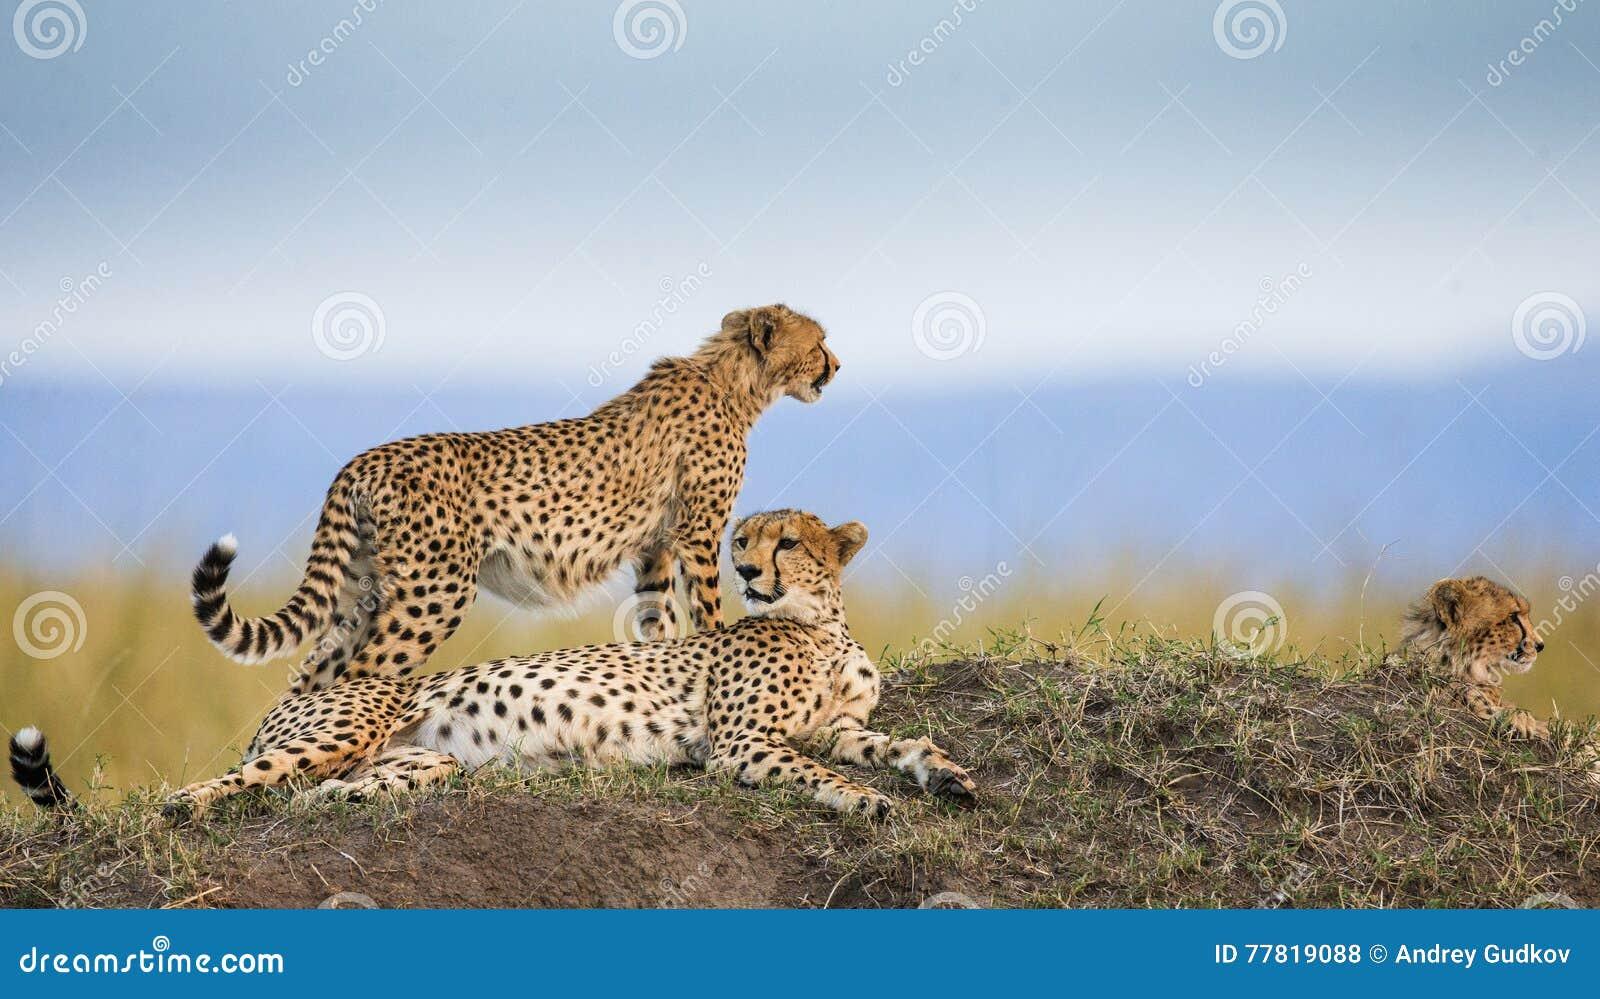 Drei Geparde in der Savanne kenia tanzania afrika Chiang Mai serengeti Maasai Mara